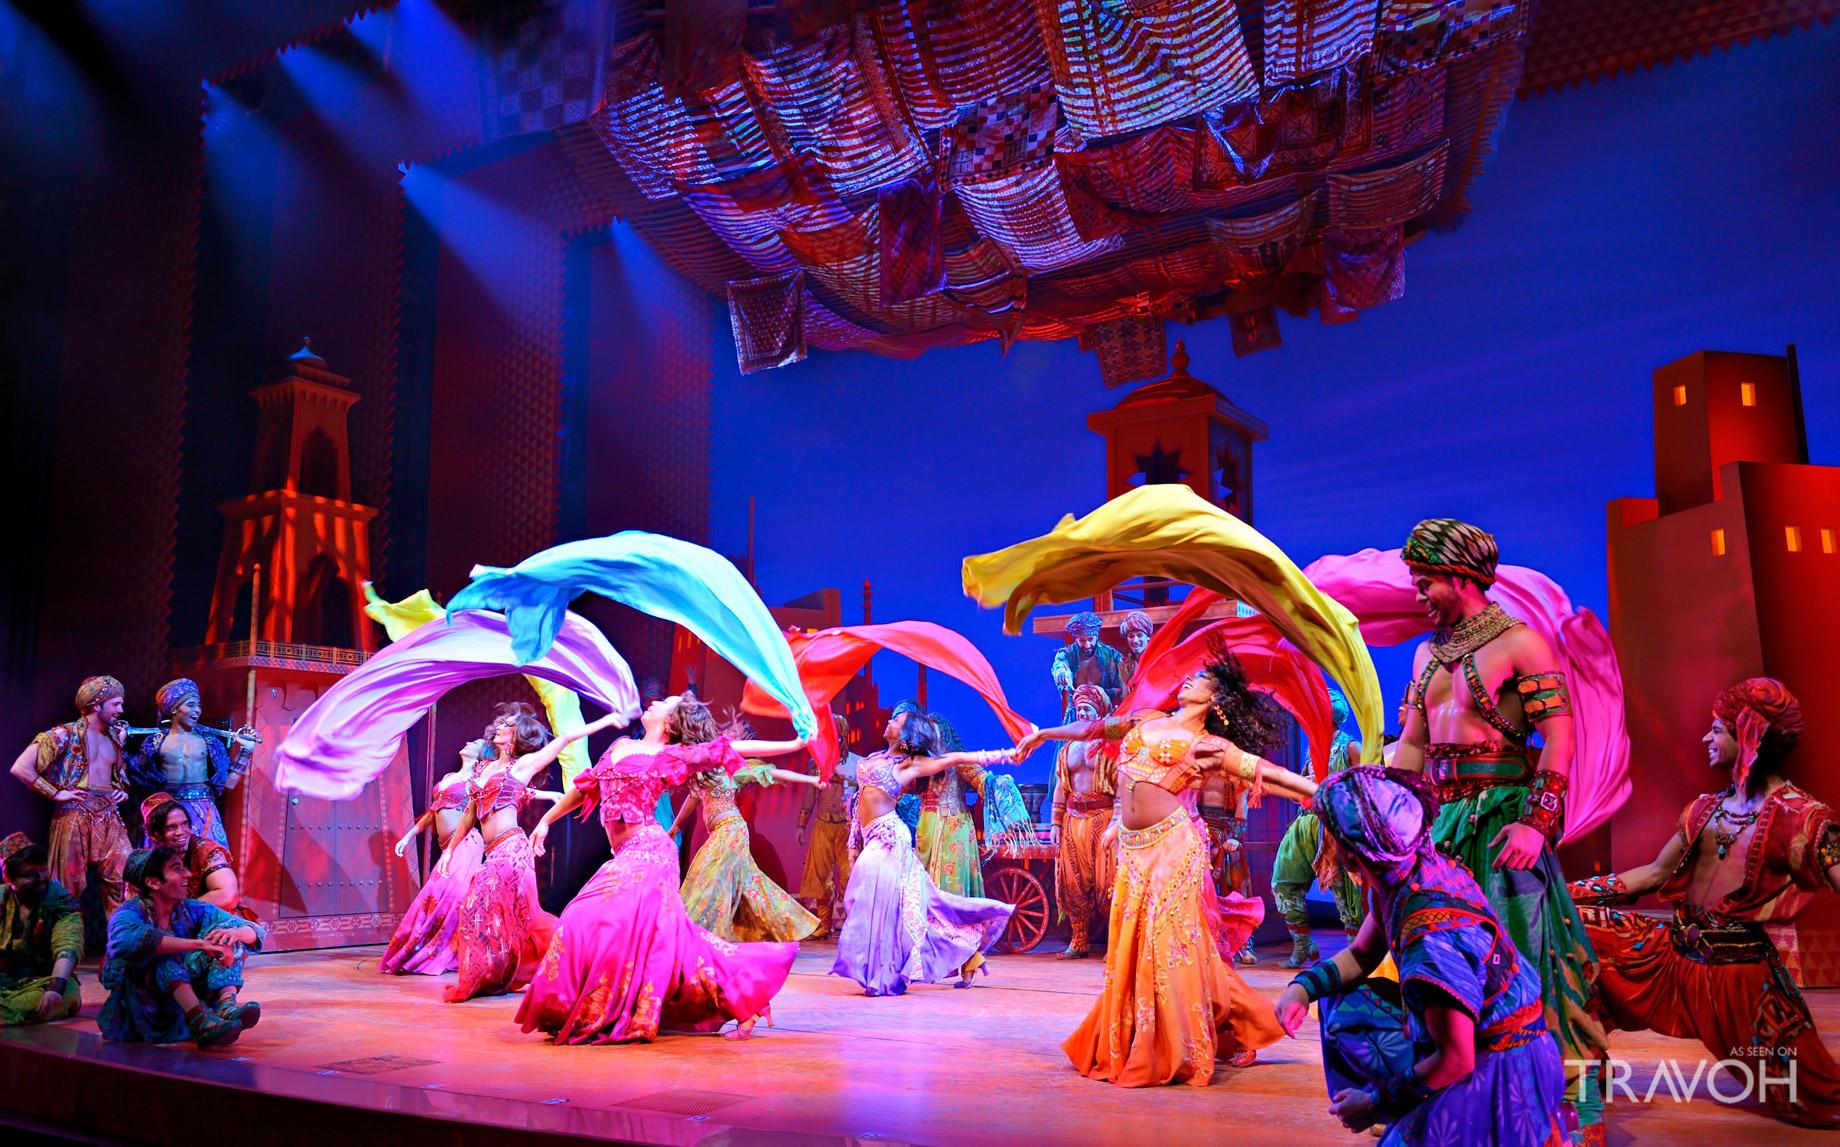 Aladdin at New Amsterdam Theatre - 214 W. 42nd St.